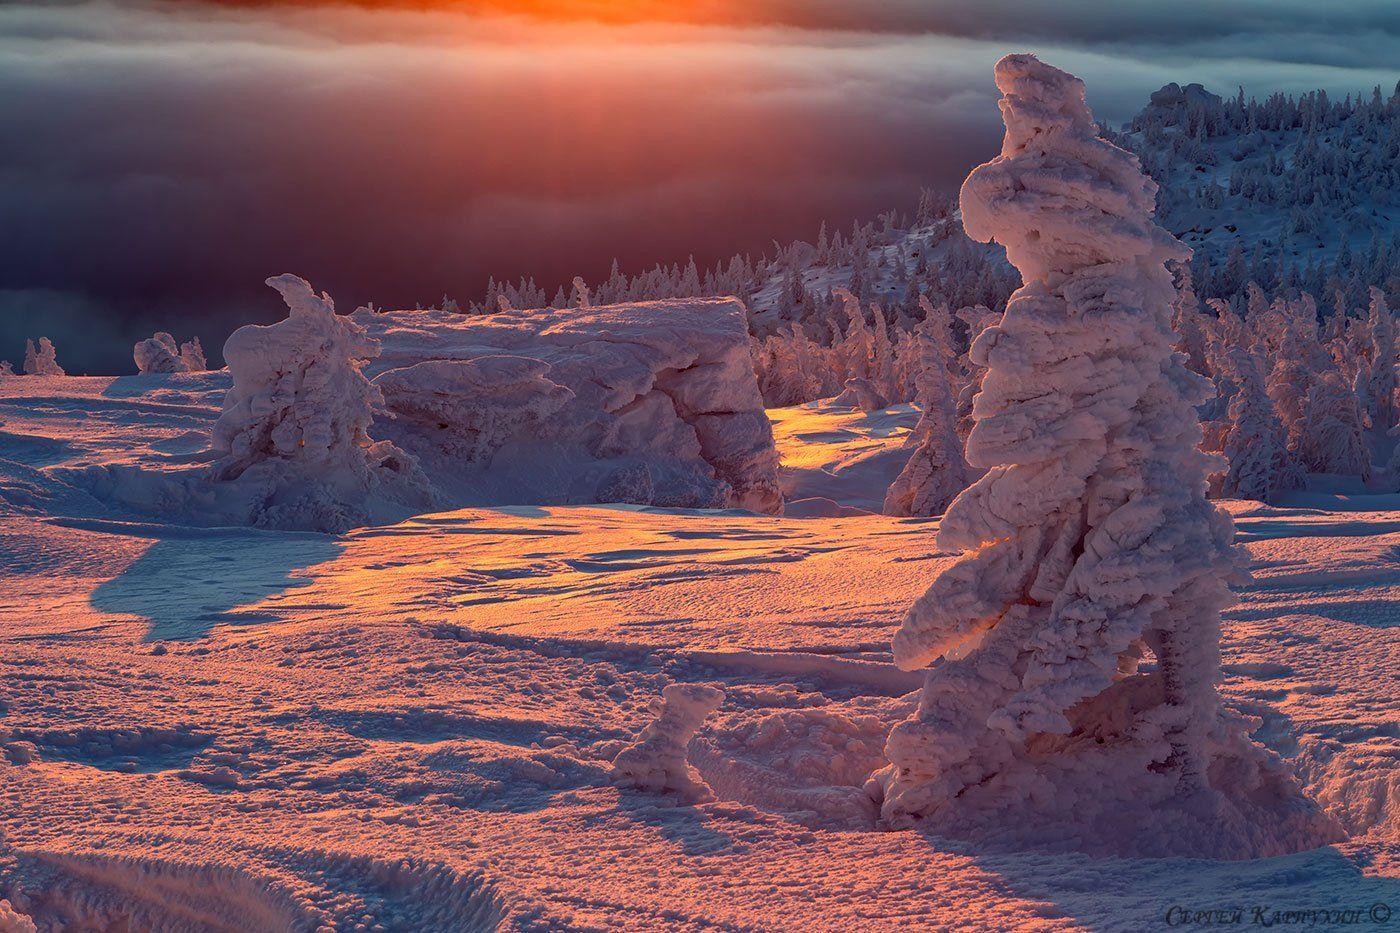 таганай, южный урал, восход, снег, Сергей Карпухин